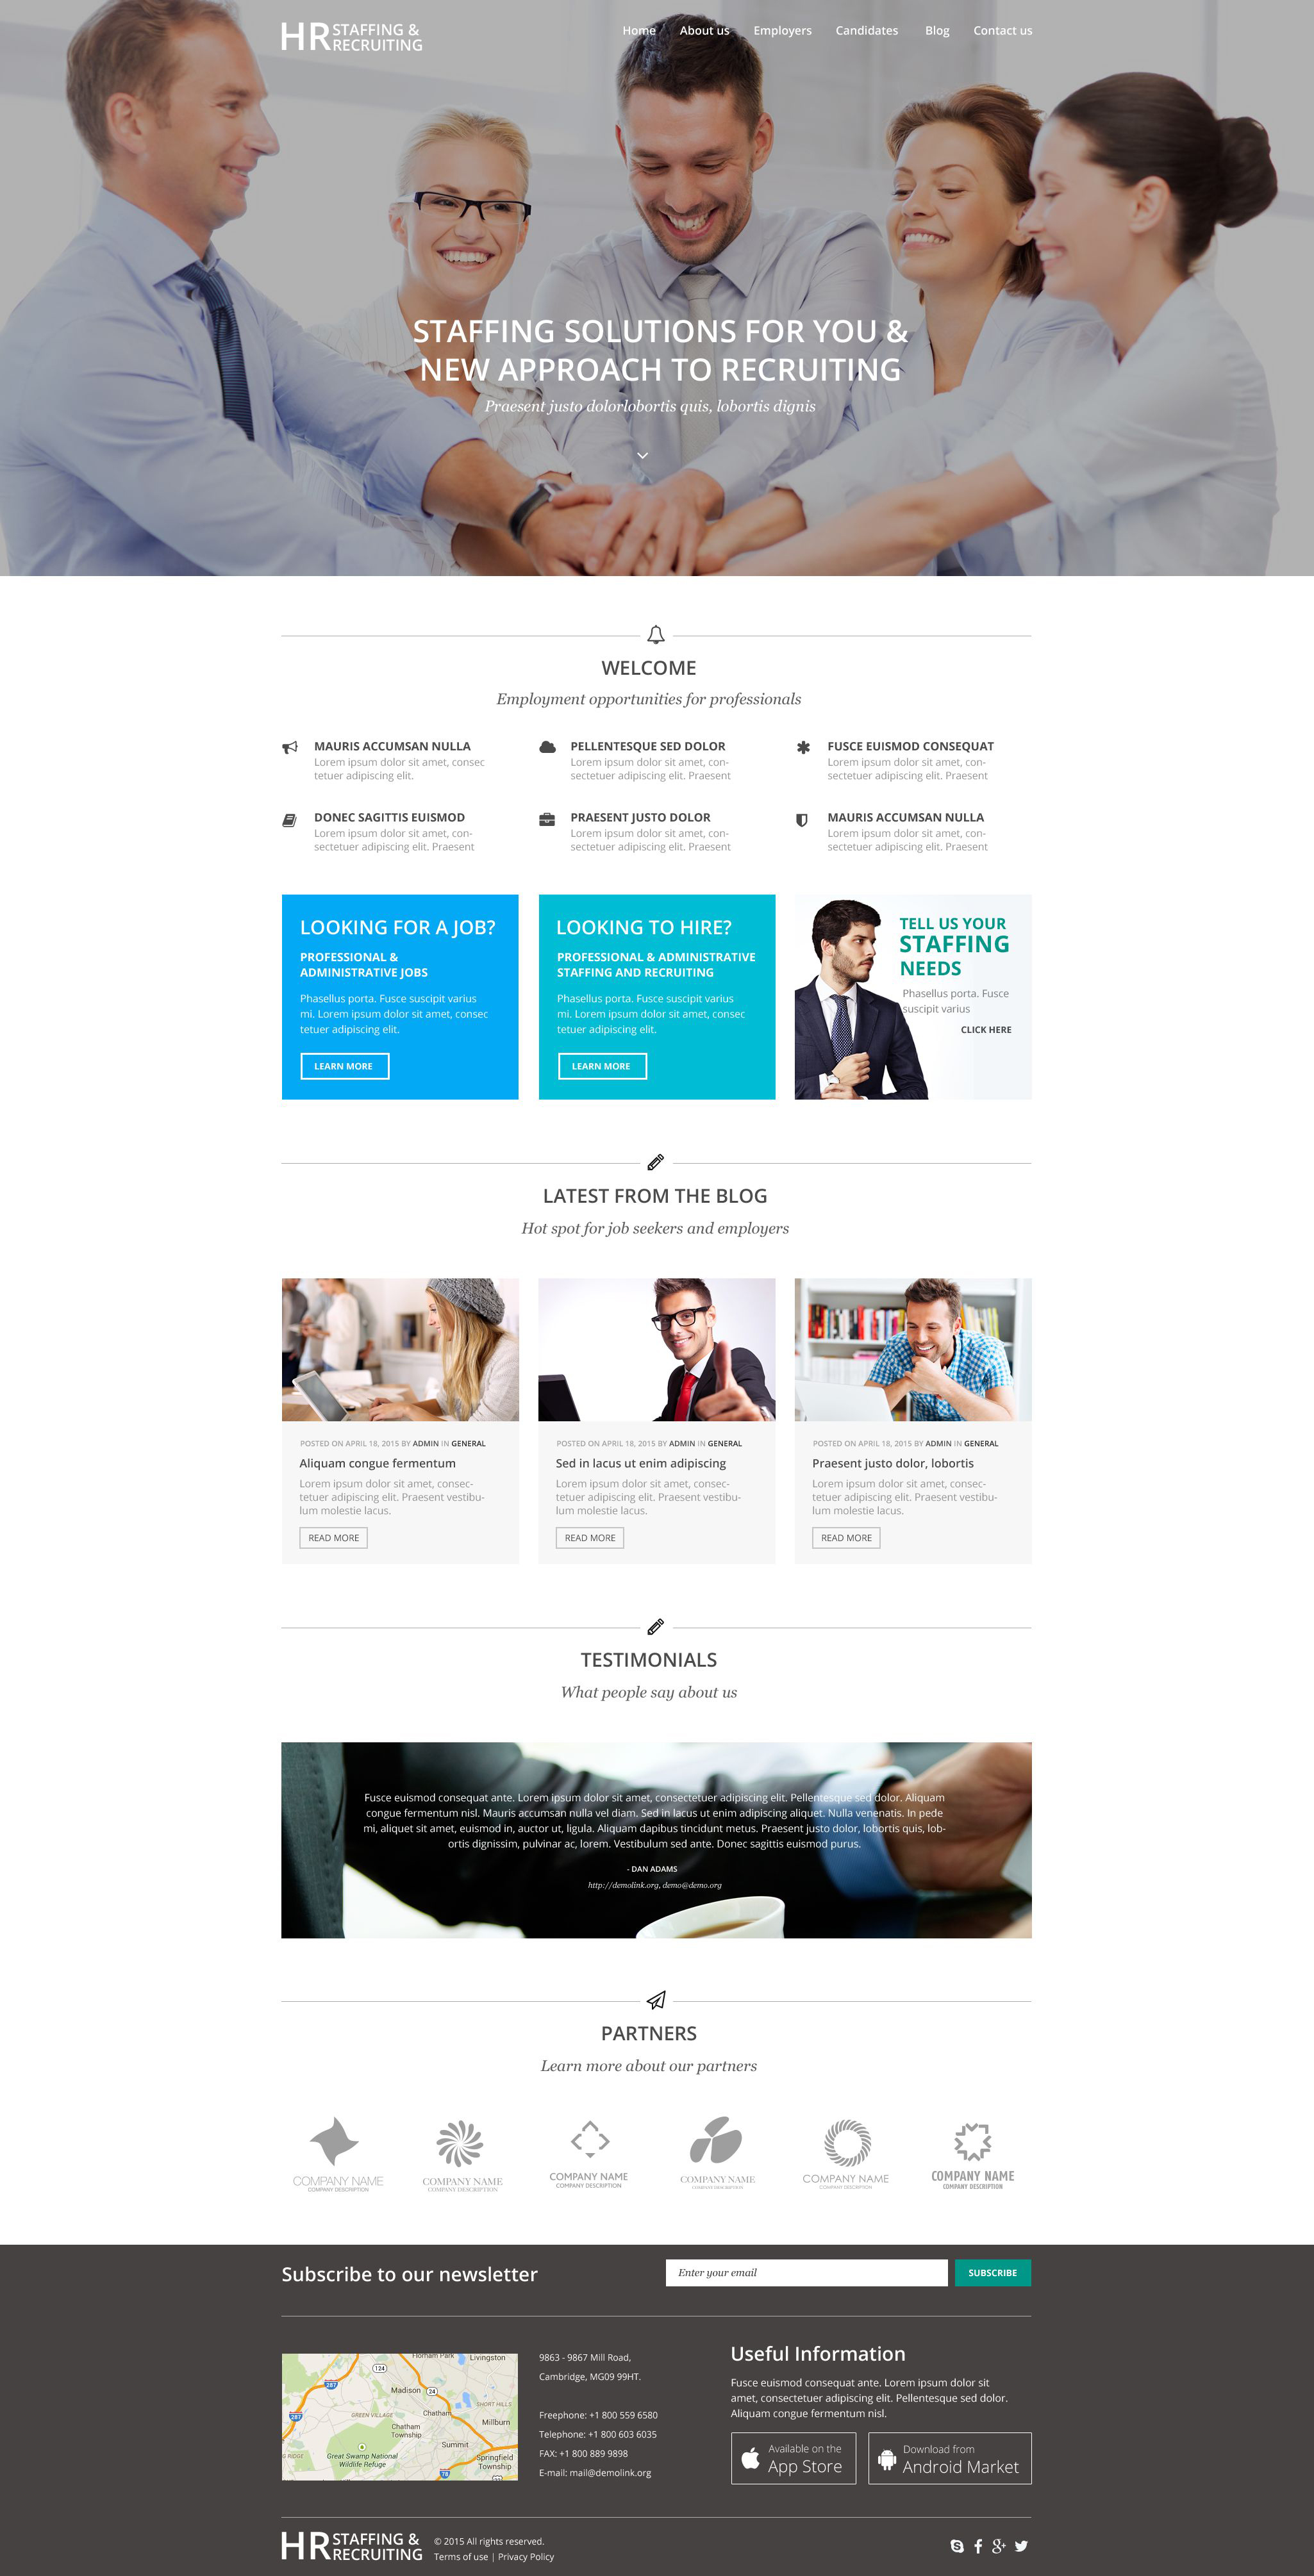 """HR Recrutement"" thème WordPress adaptatif #55047 - screenshot"